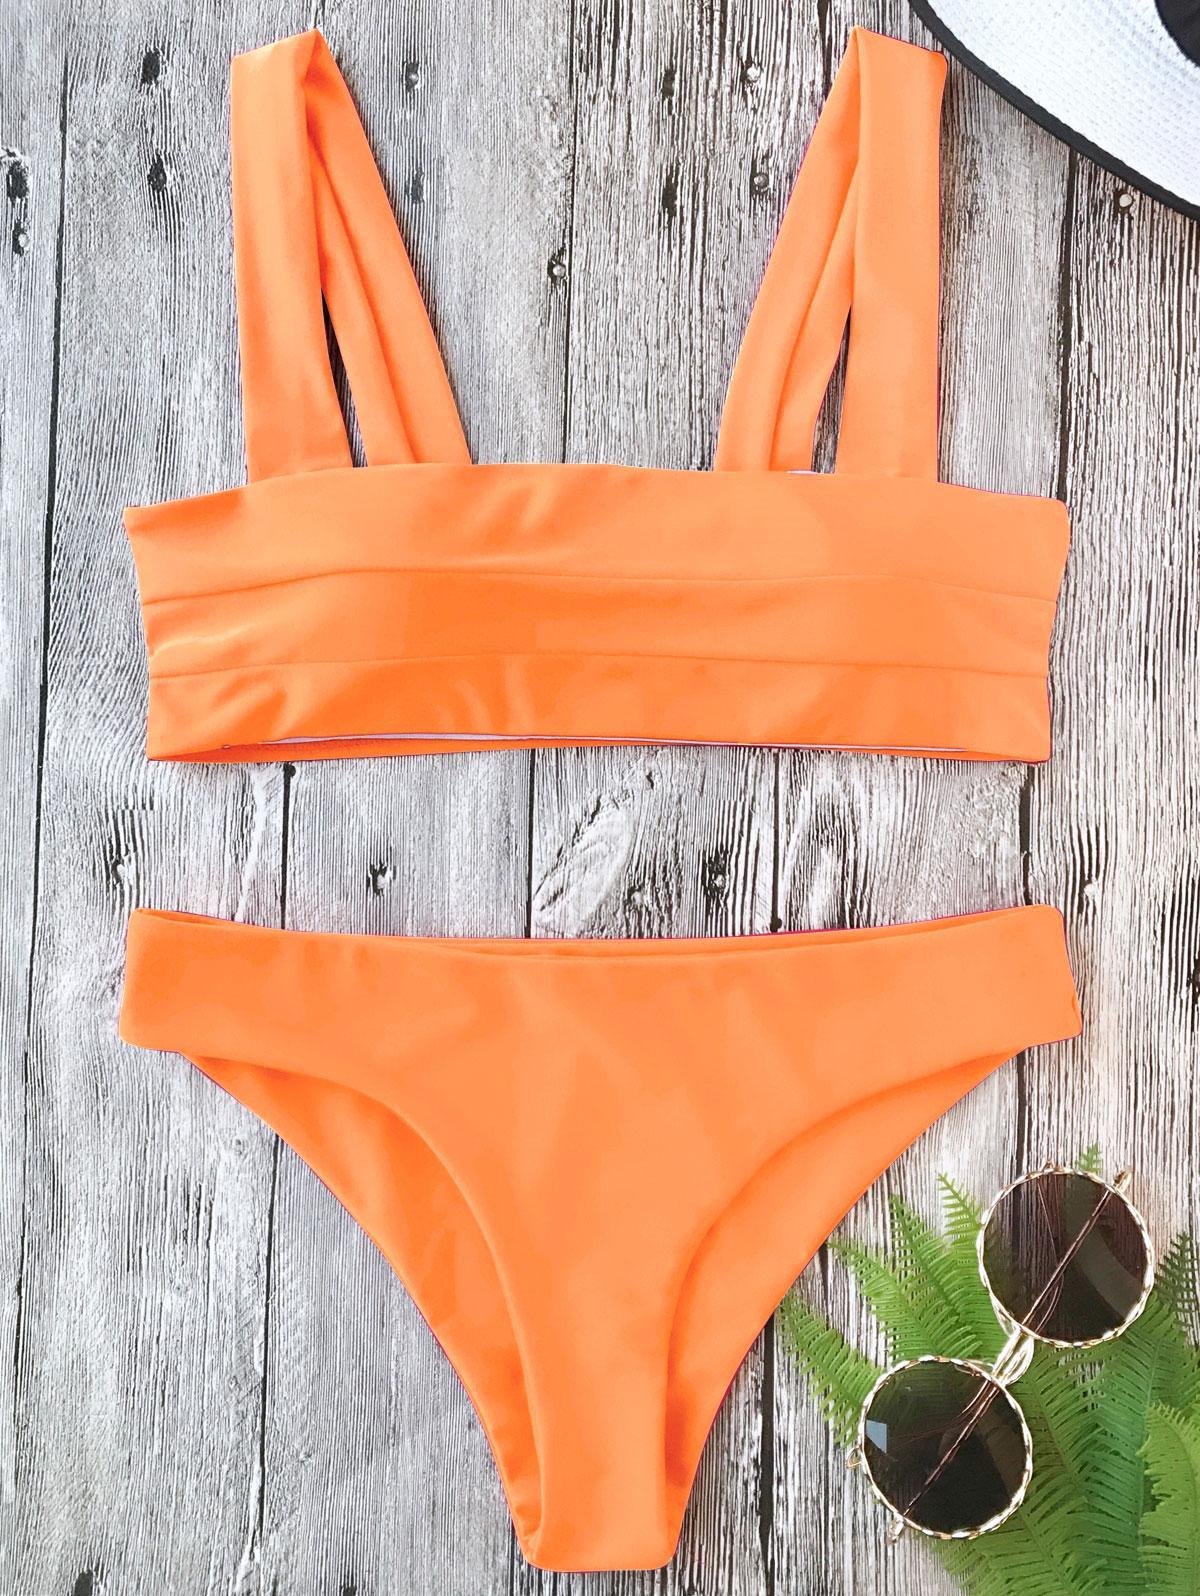 Padded Wide Straps Bandeau Neon Bikini Set фото